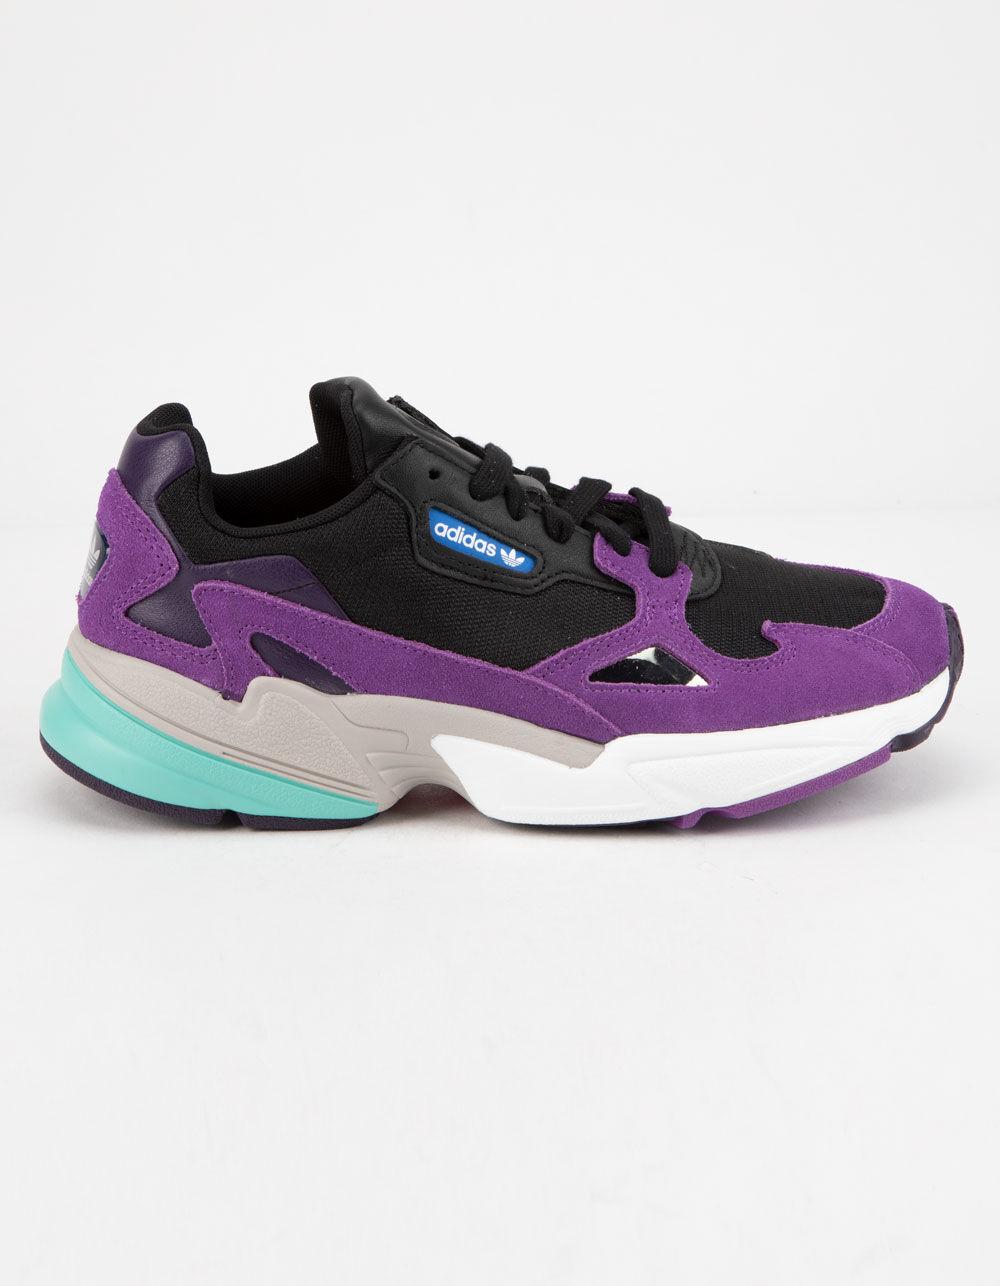 ADIDAS Falcon Core Black & Active Purple Shoes